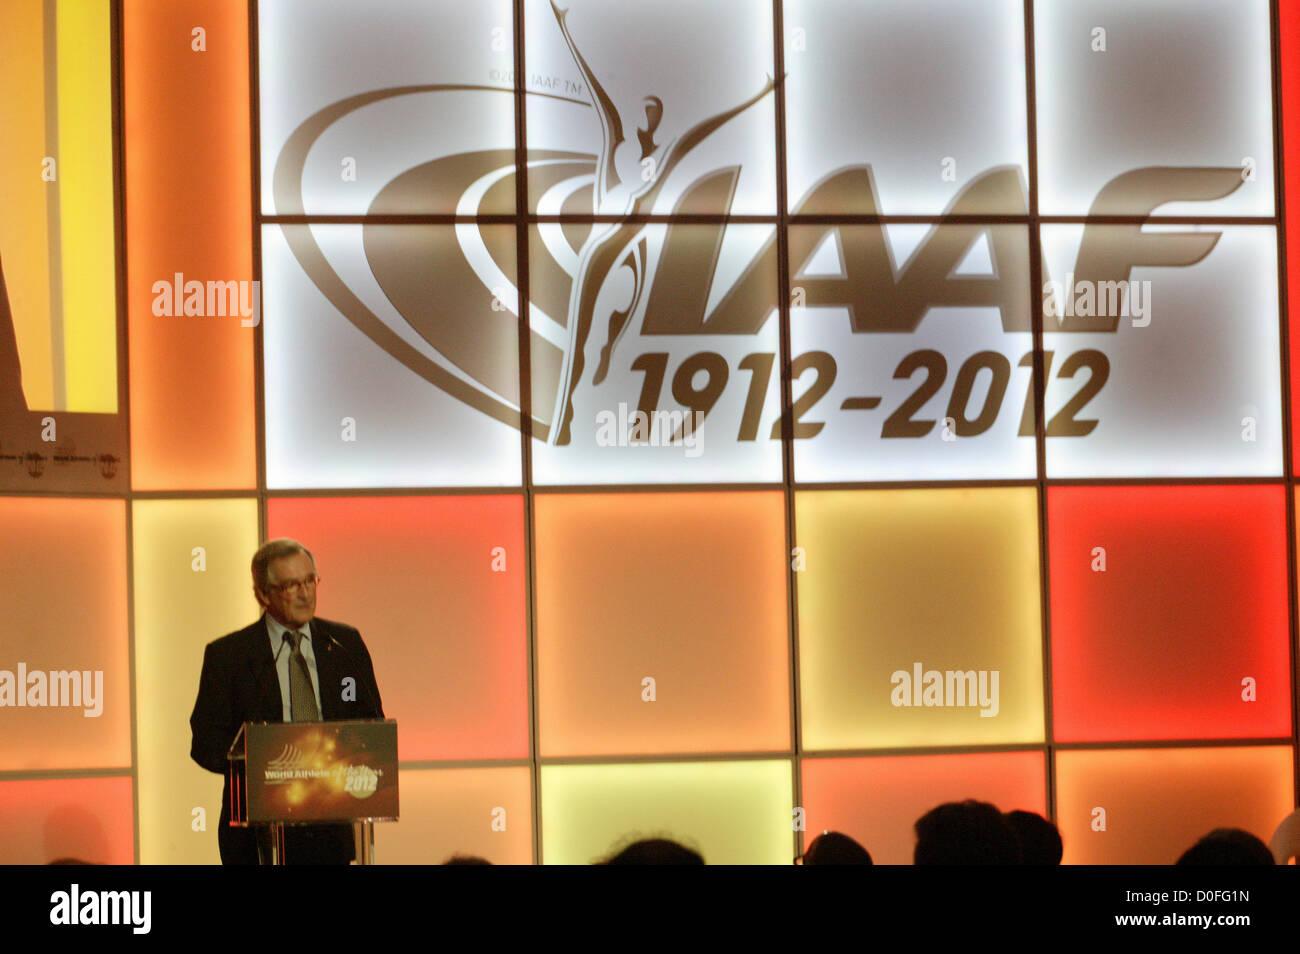 November 24th, Barcelona, Spain. IAAF, International Association of Athletics Federations, celebrates the 2012 World - Stock Image